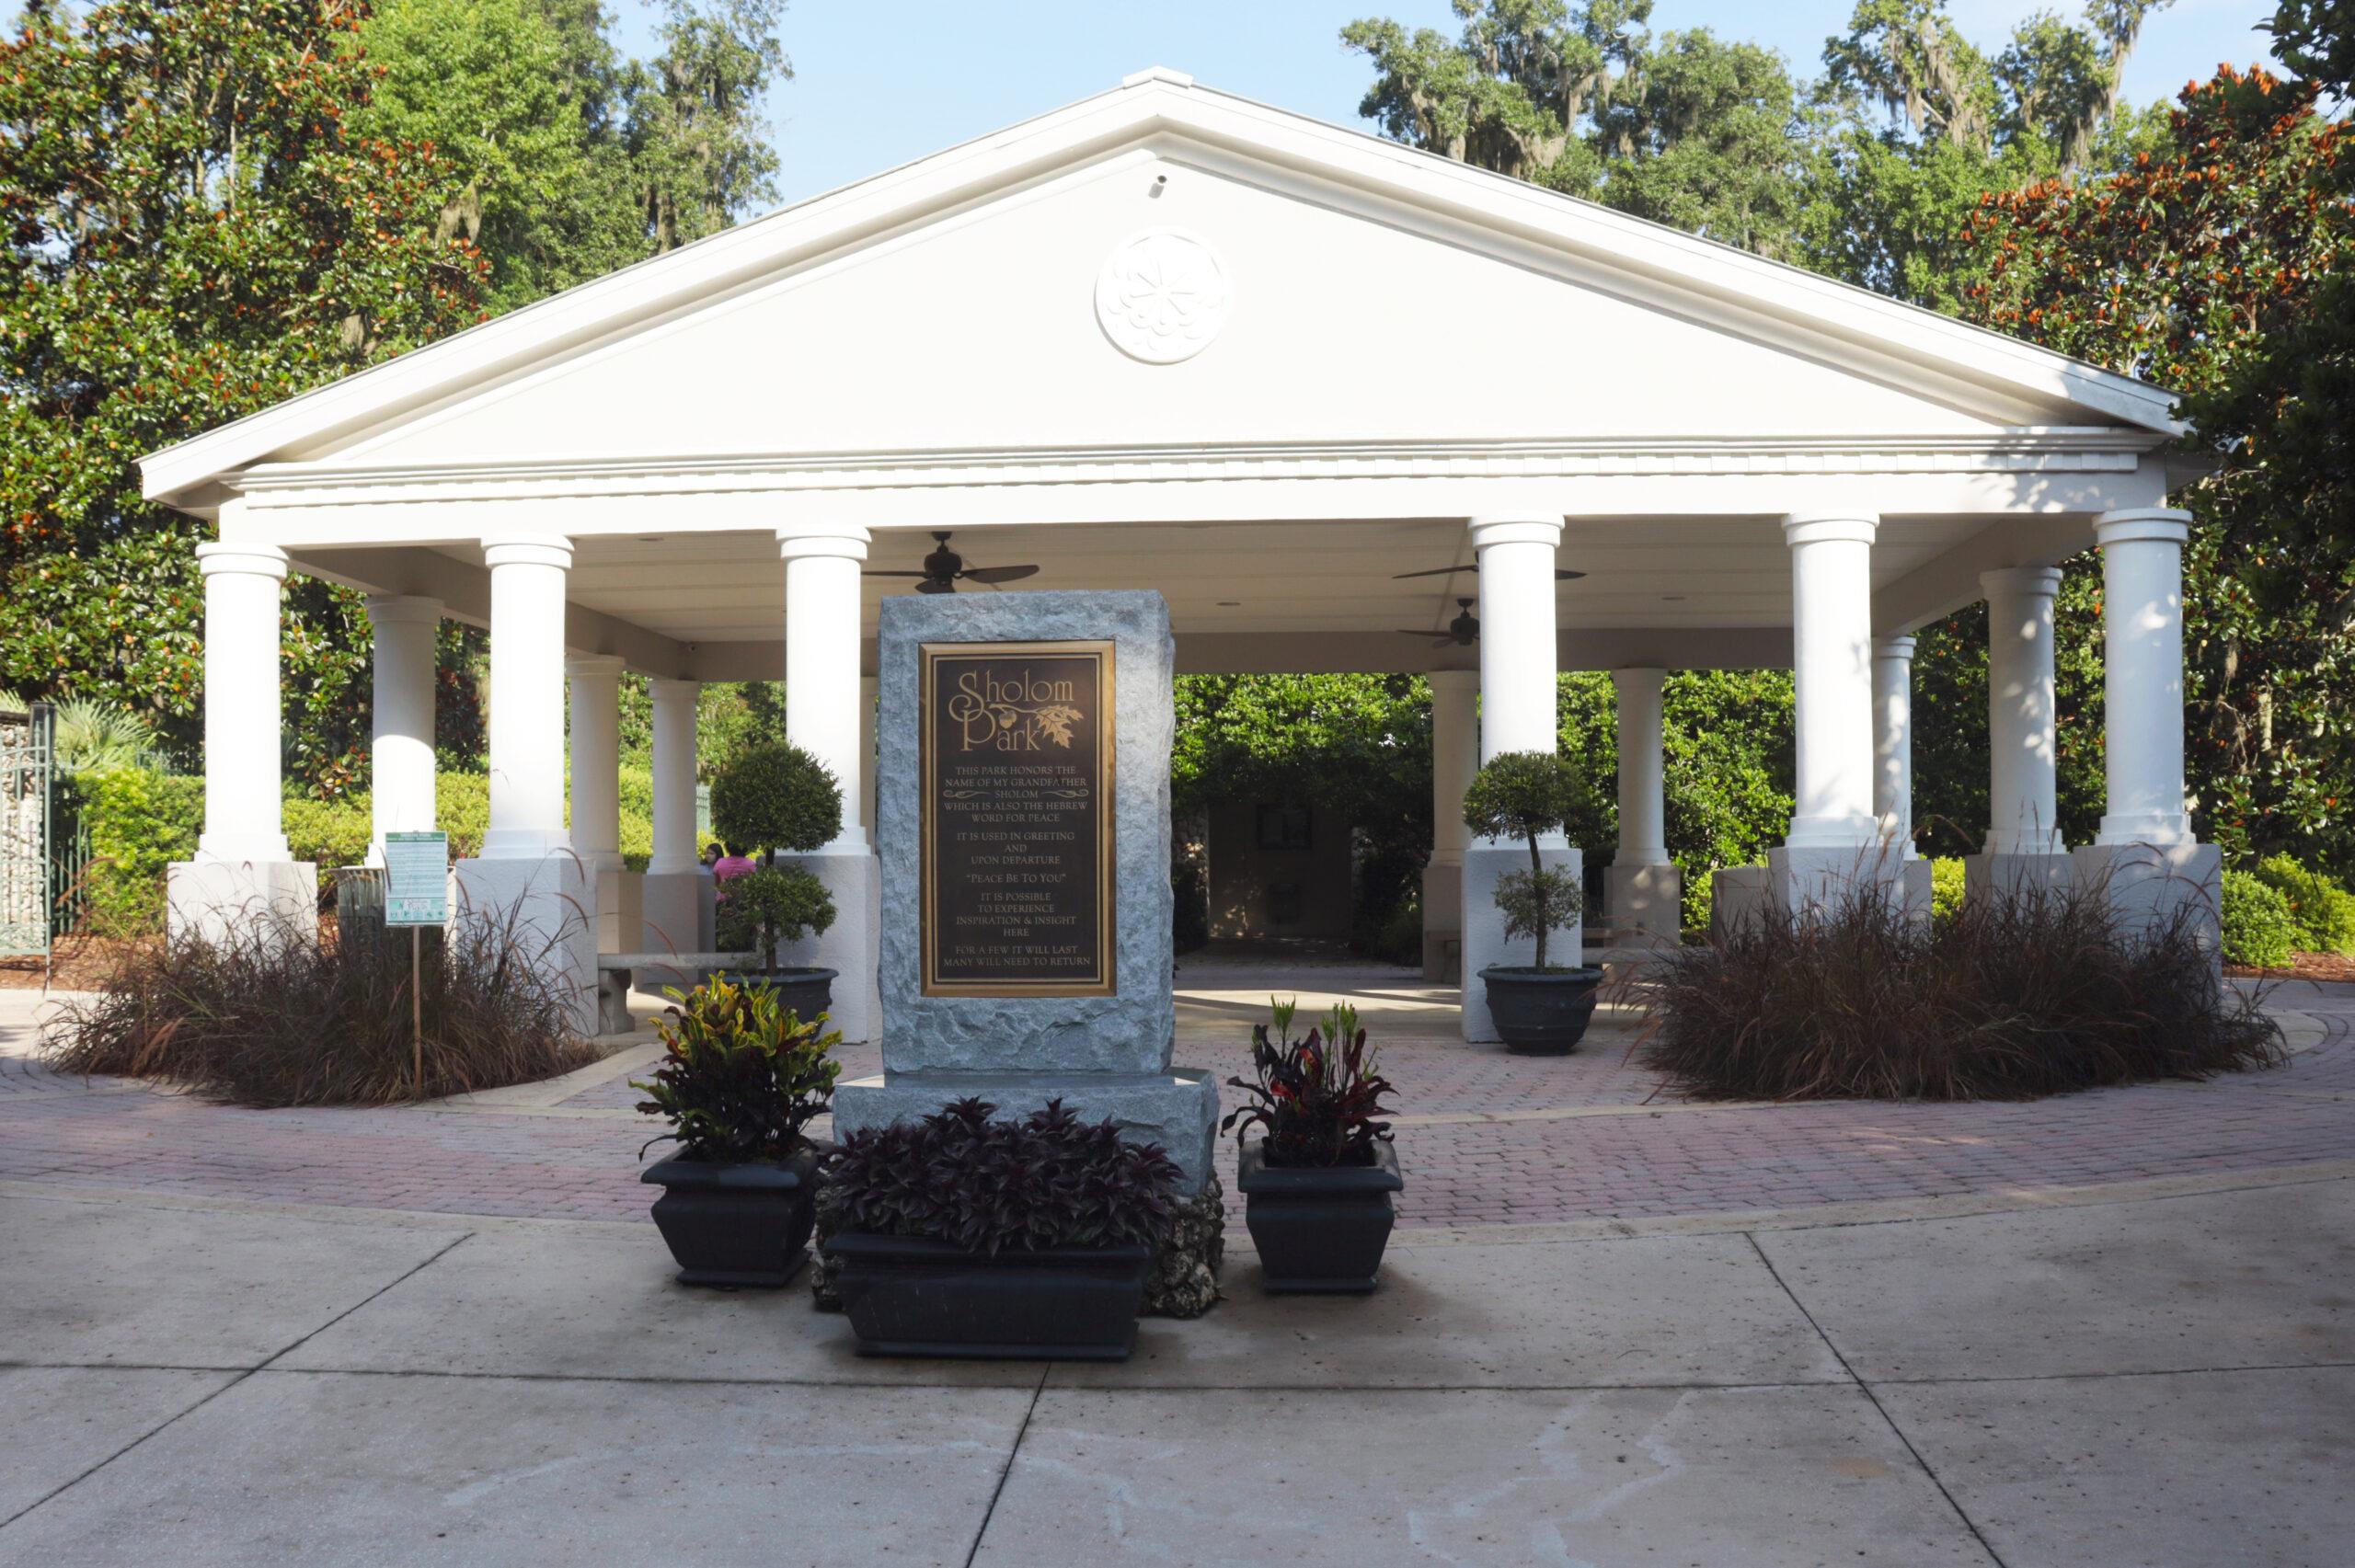 Sholom Park - Pavillion